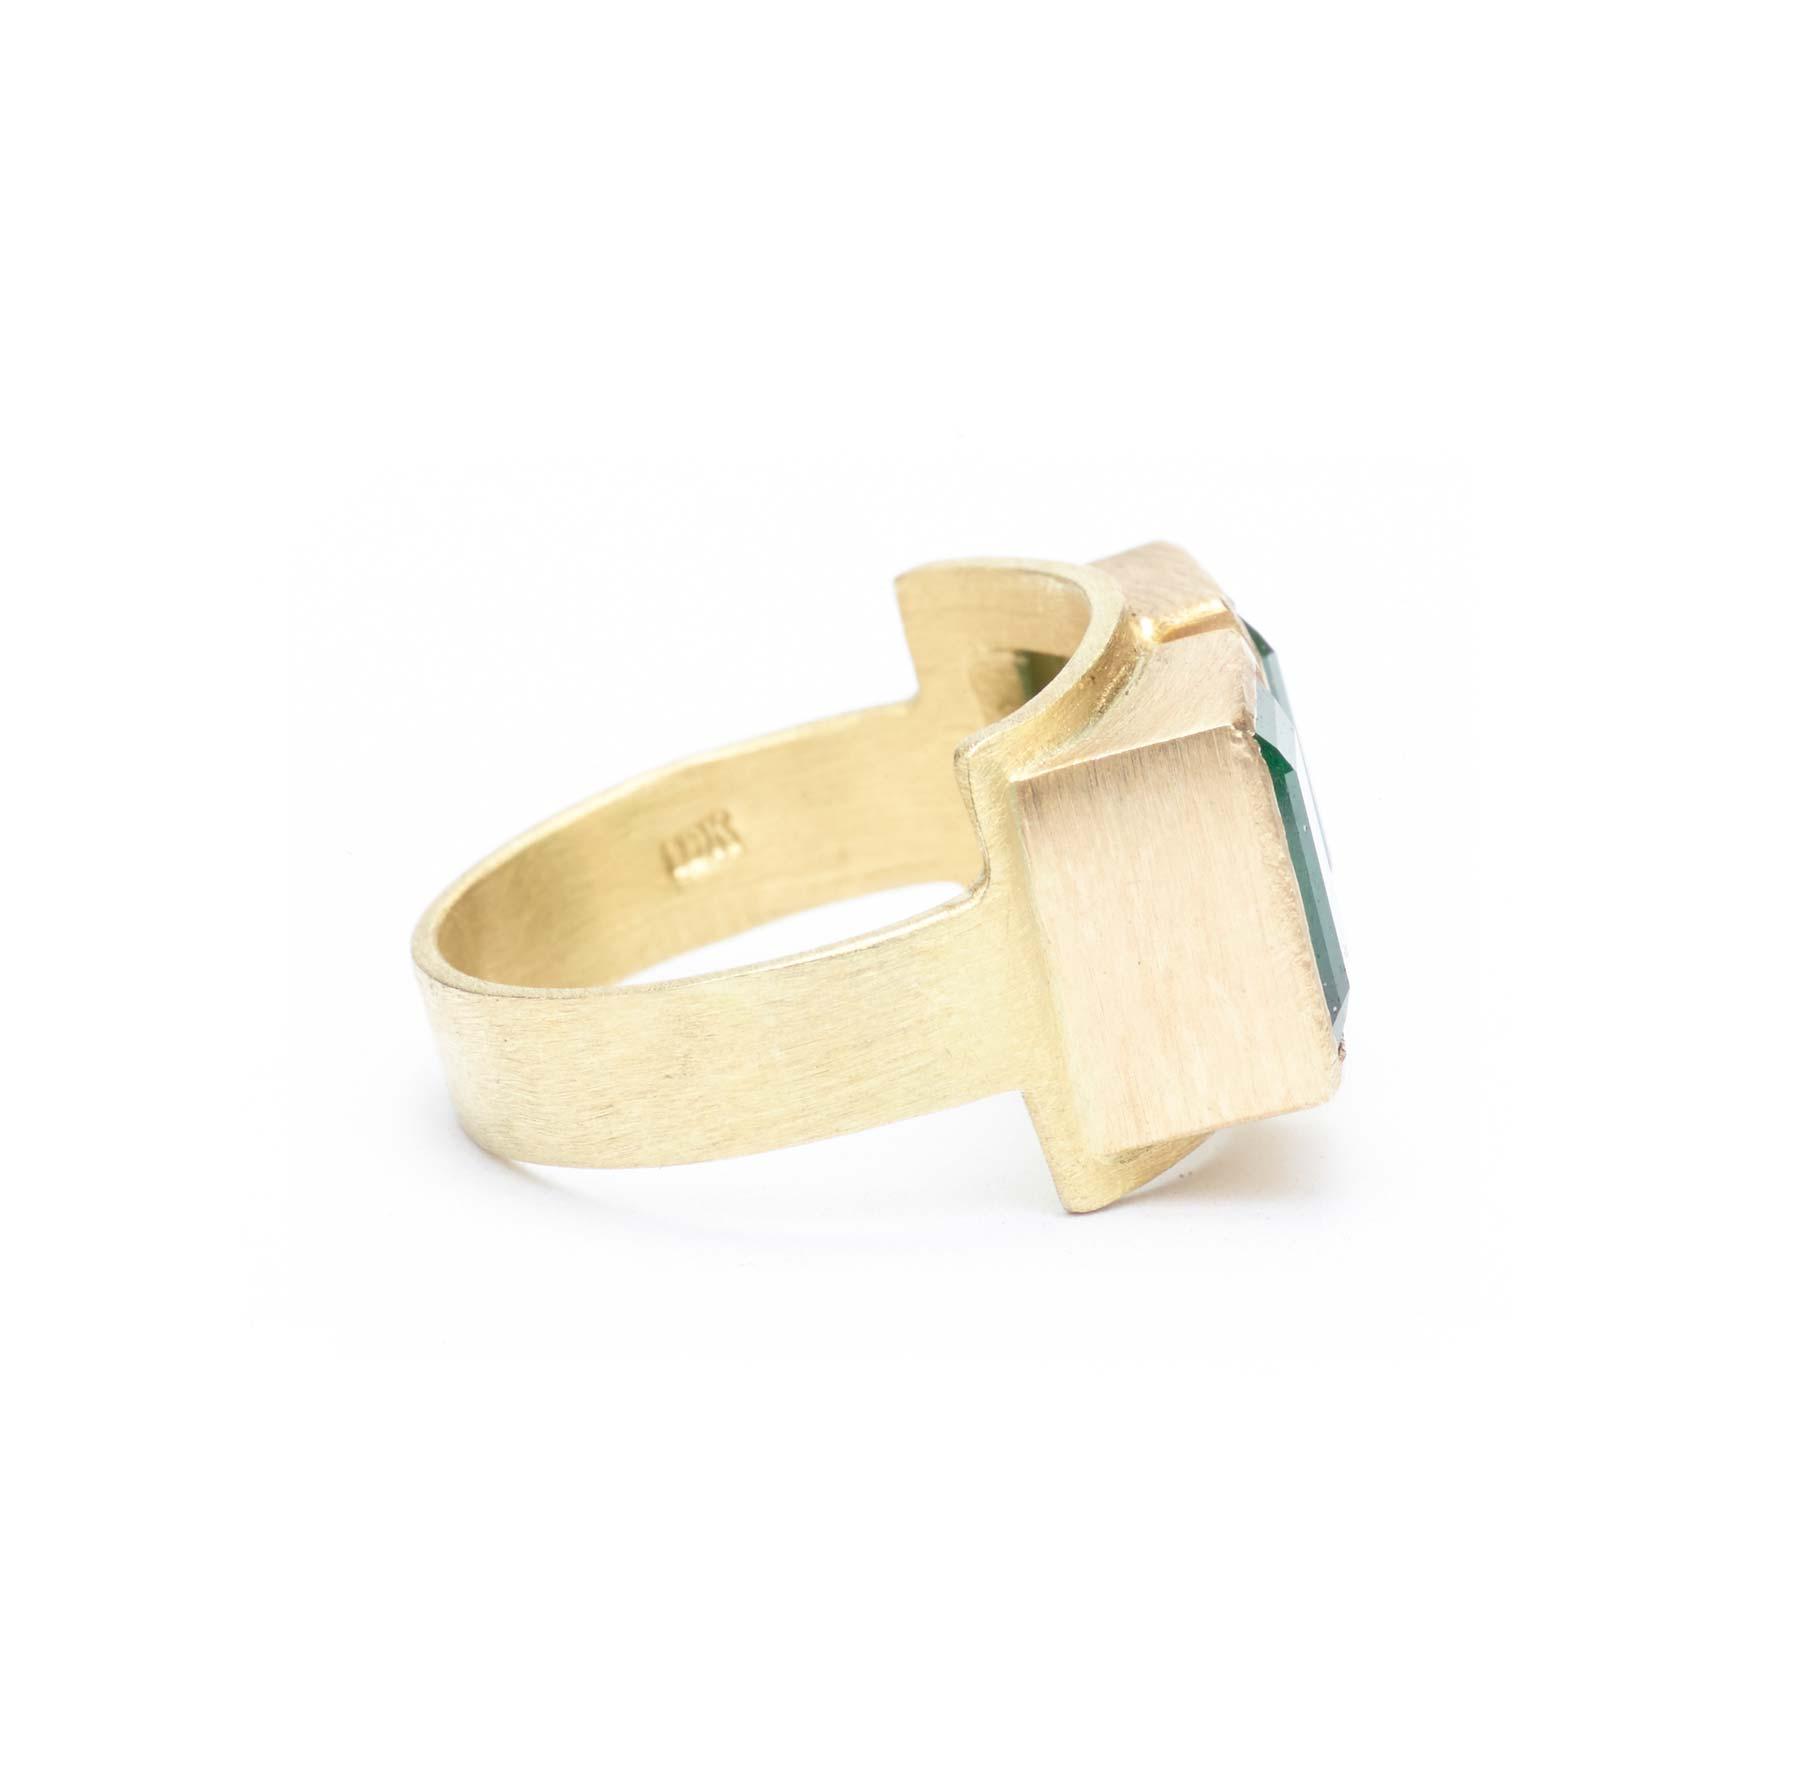 handmade-Emerald-and-18k-gold-ring-custom-made-in-austin-tx.jpg